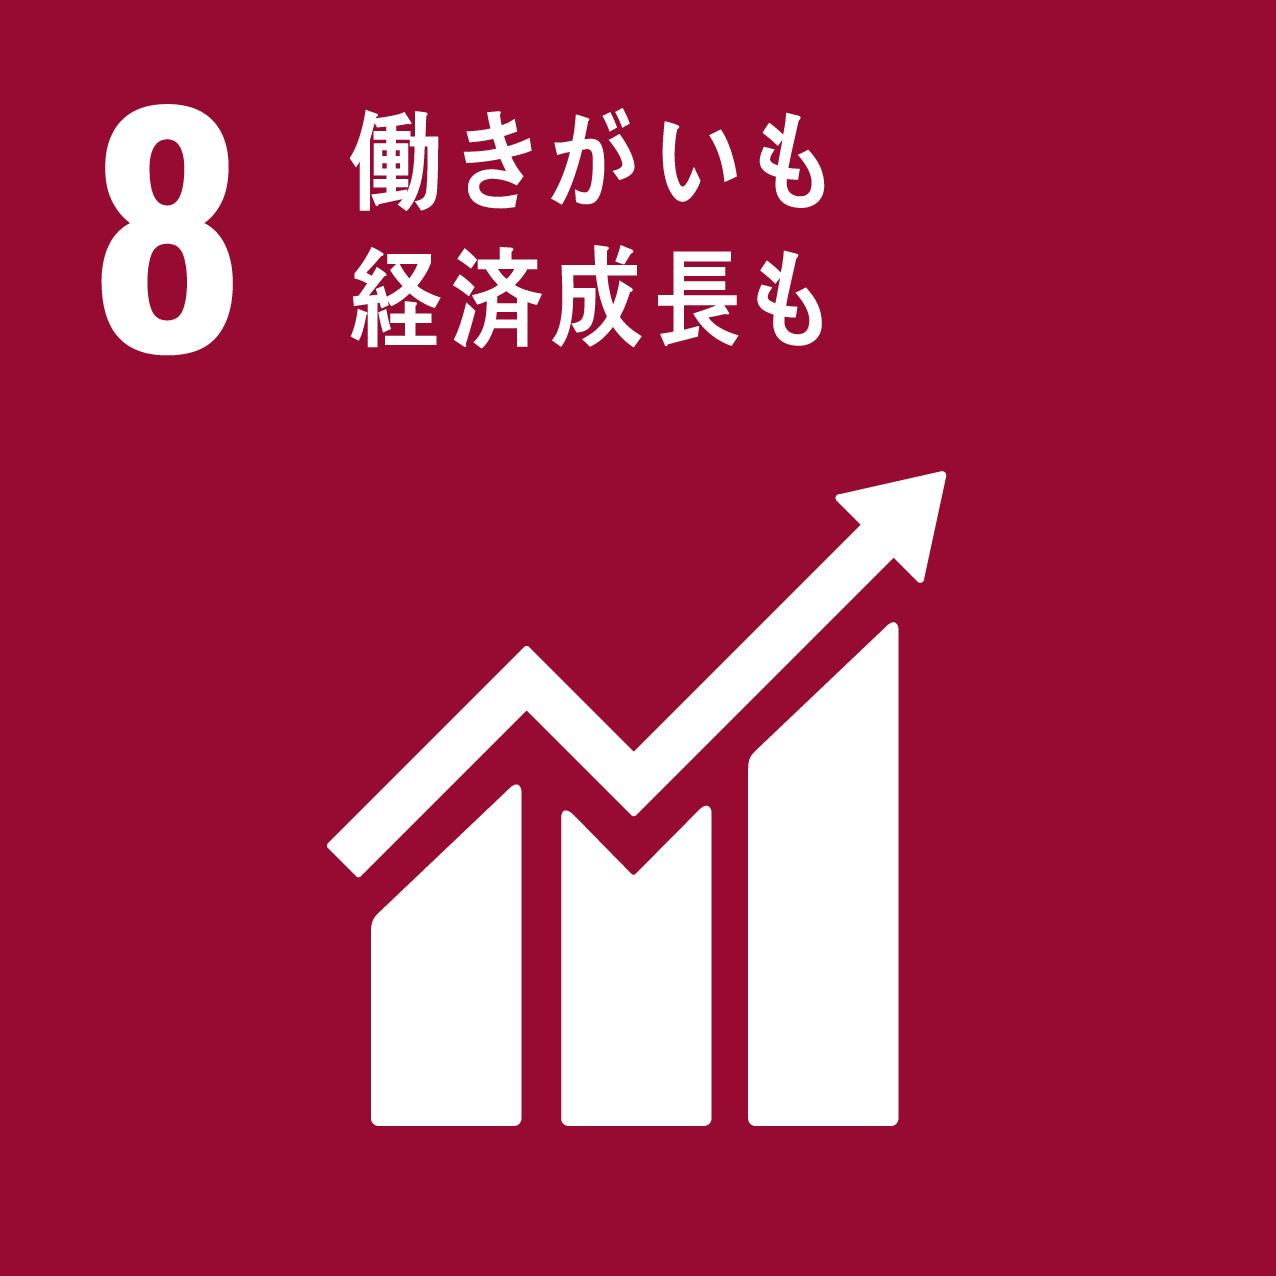 SDGs目標アイコン 8.働きがいも経済成長も